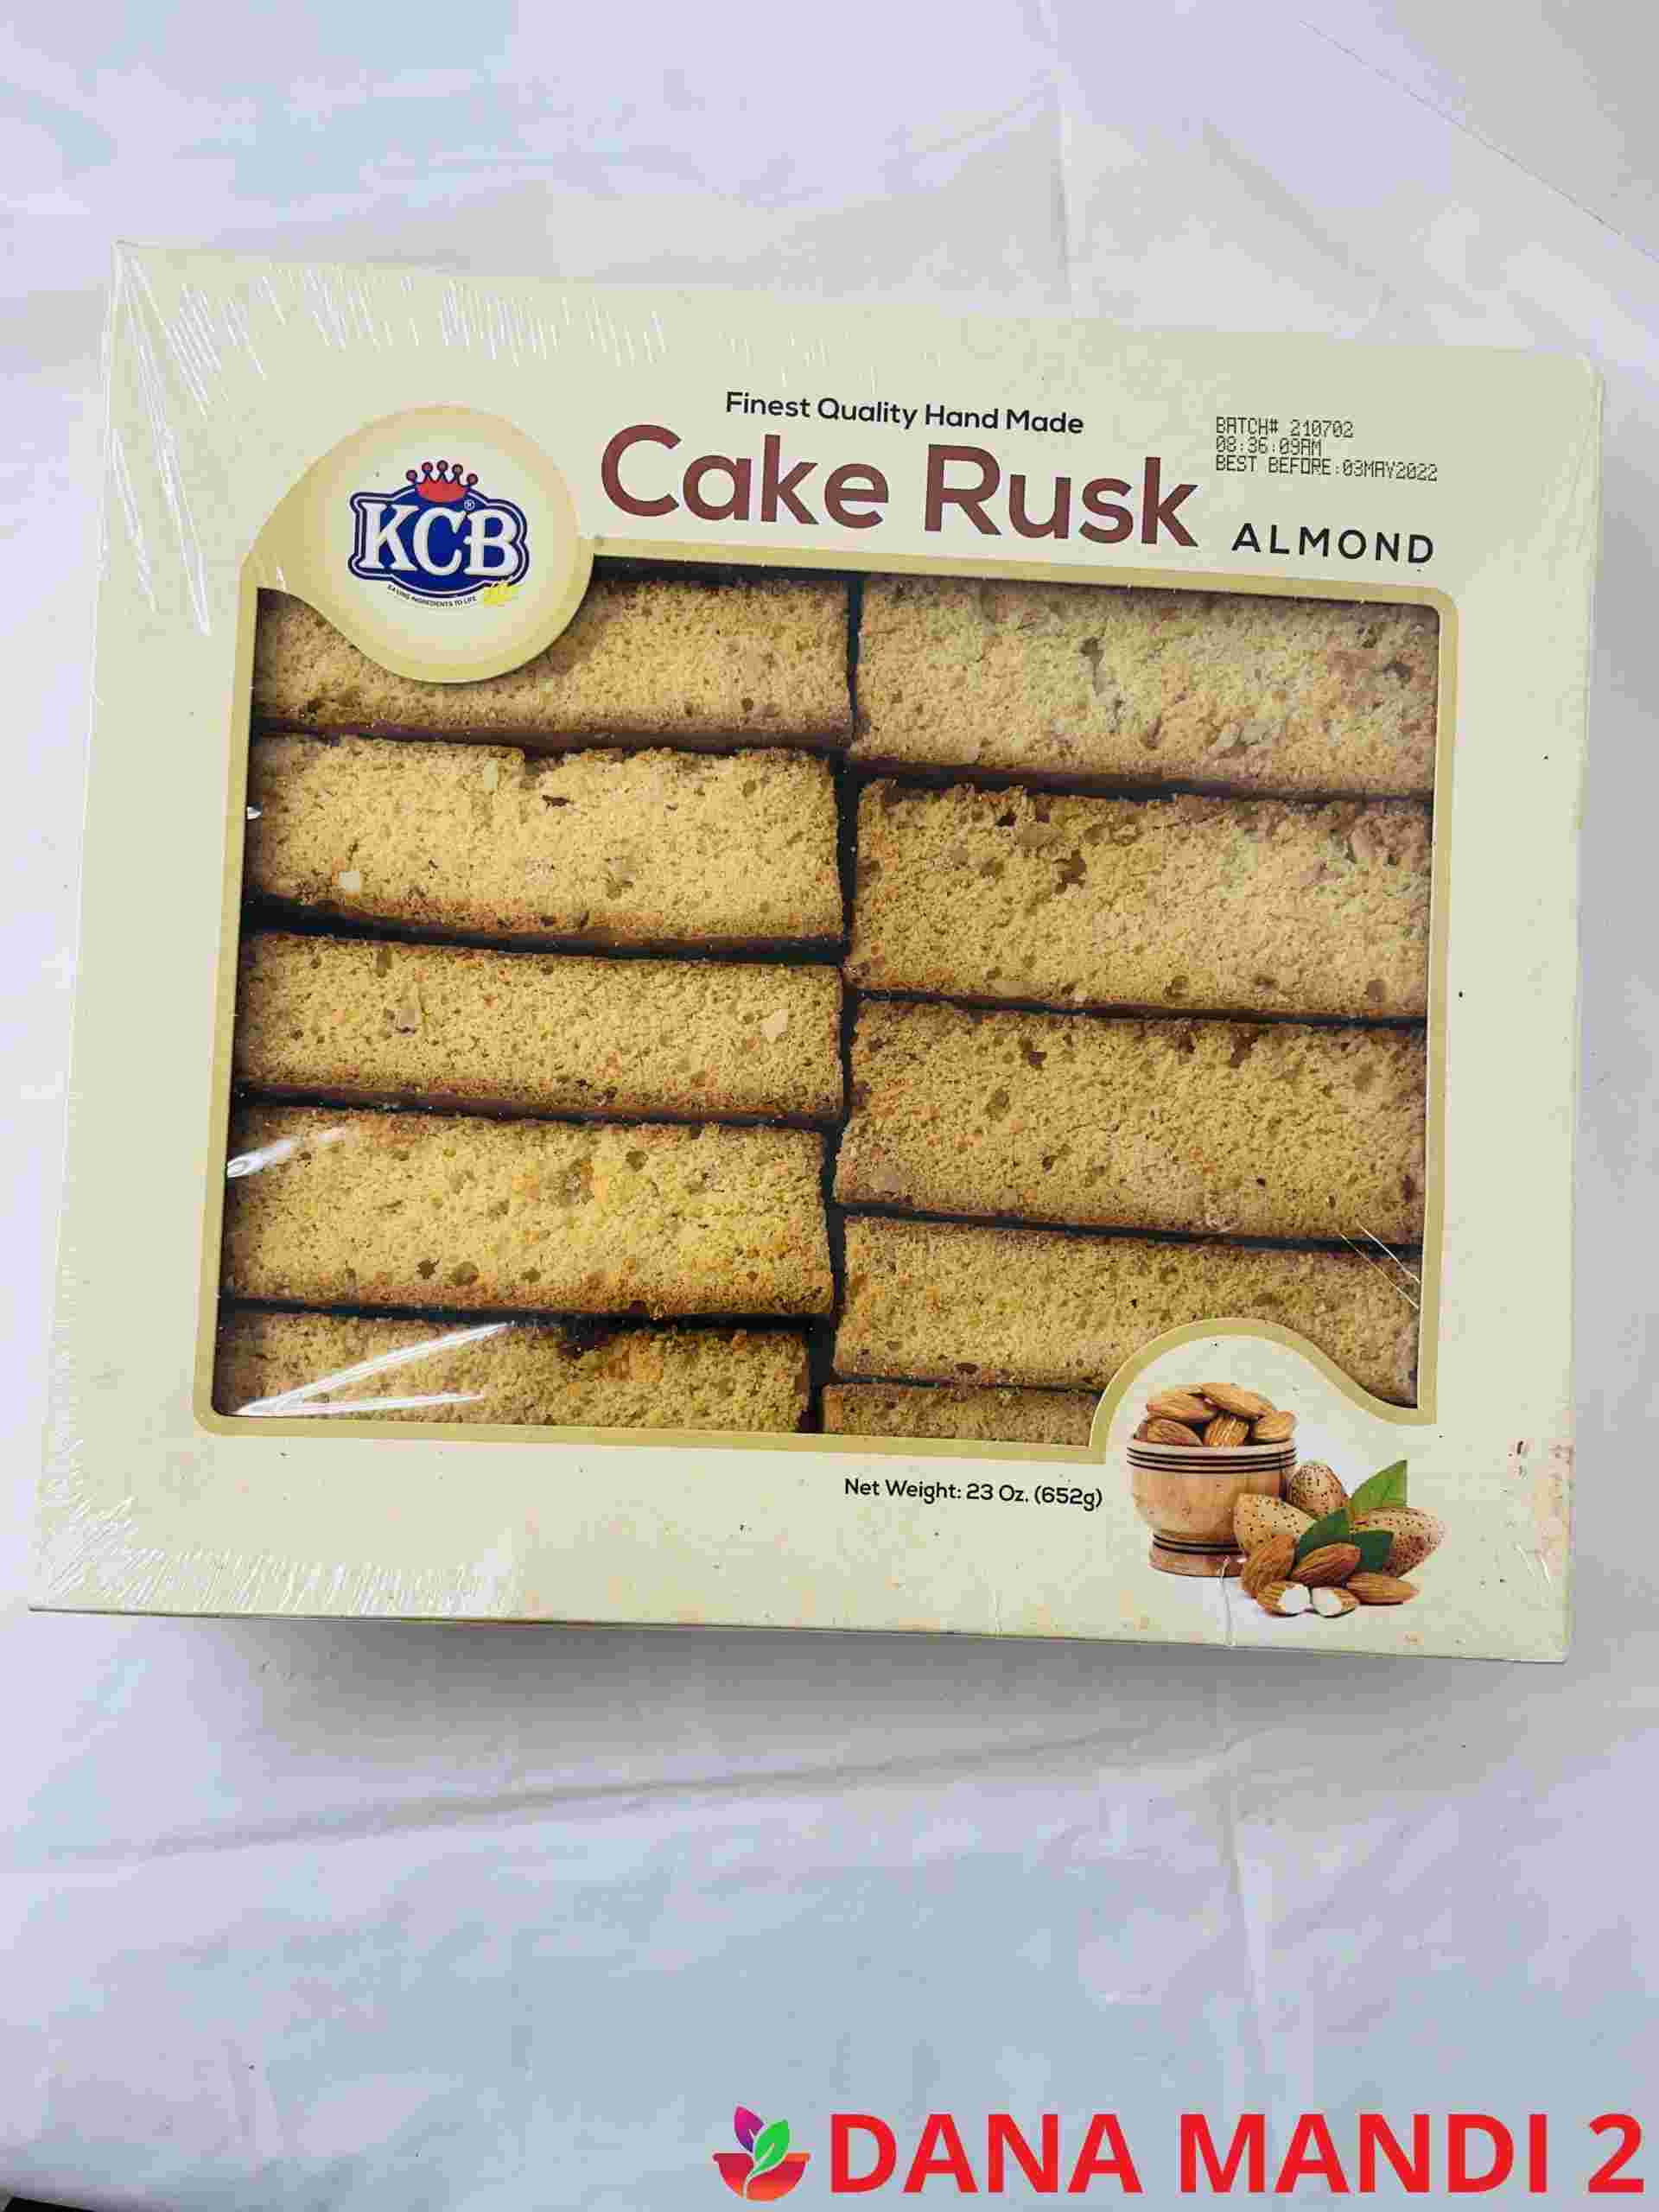 KCB Cake Rusk Almond